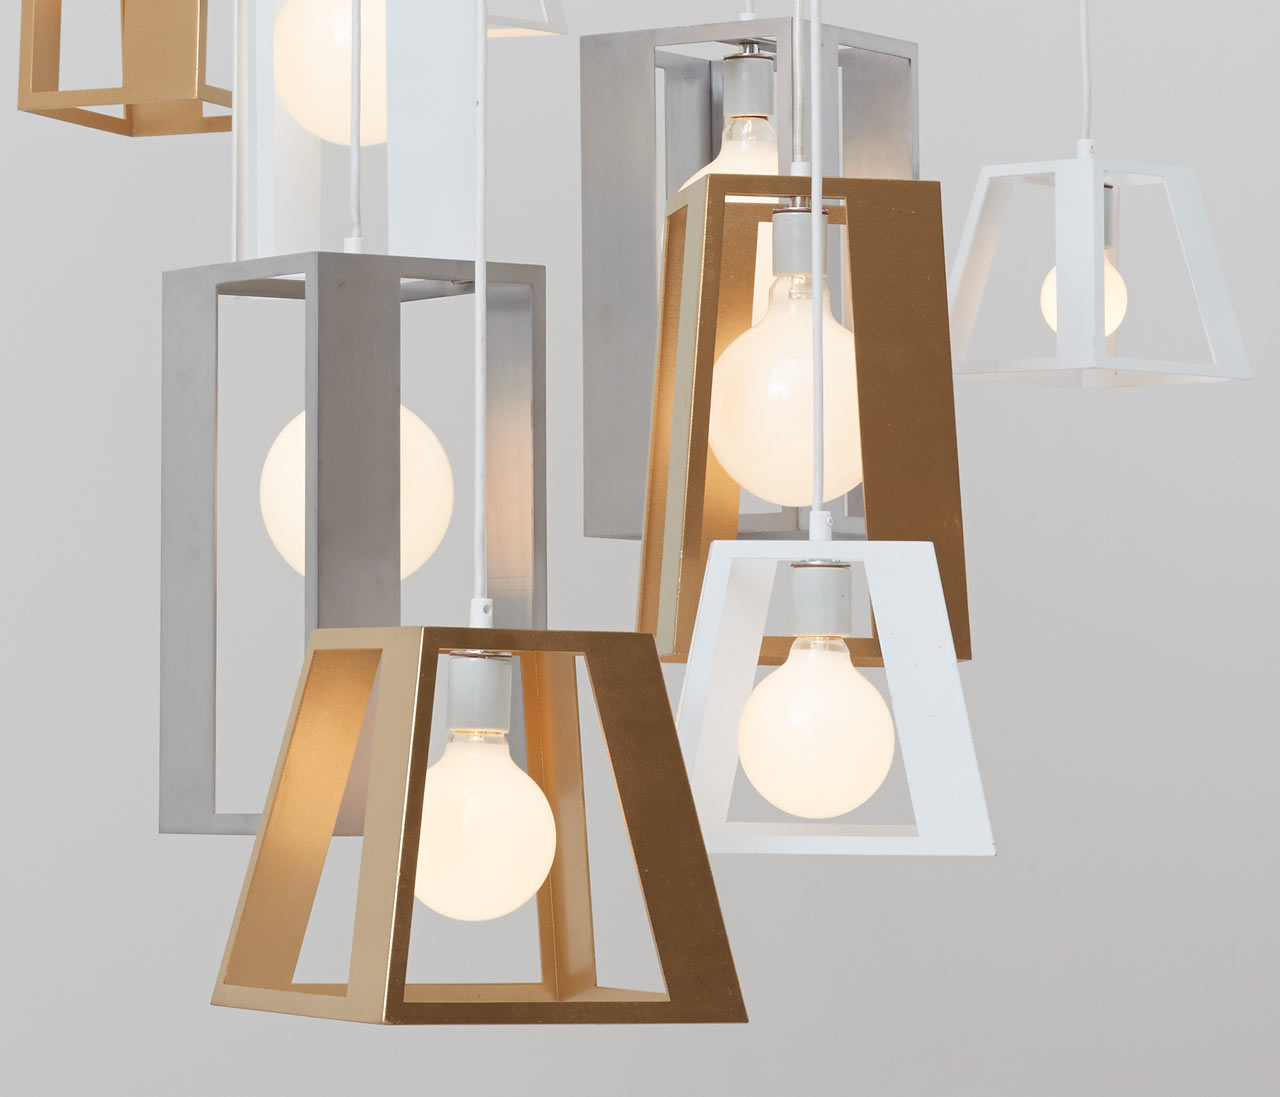 Lantern Helix Chandelier by Think Fabricate